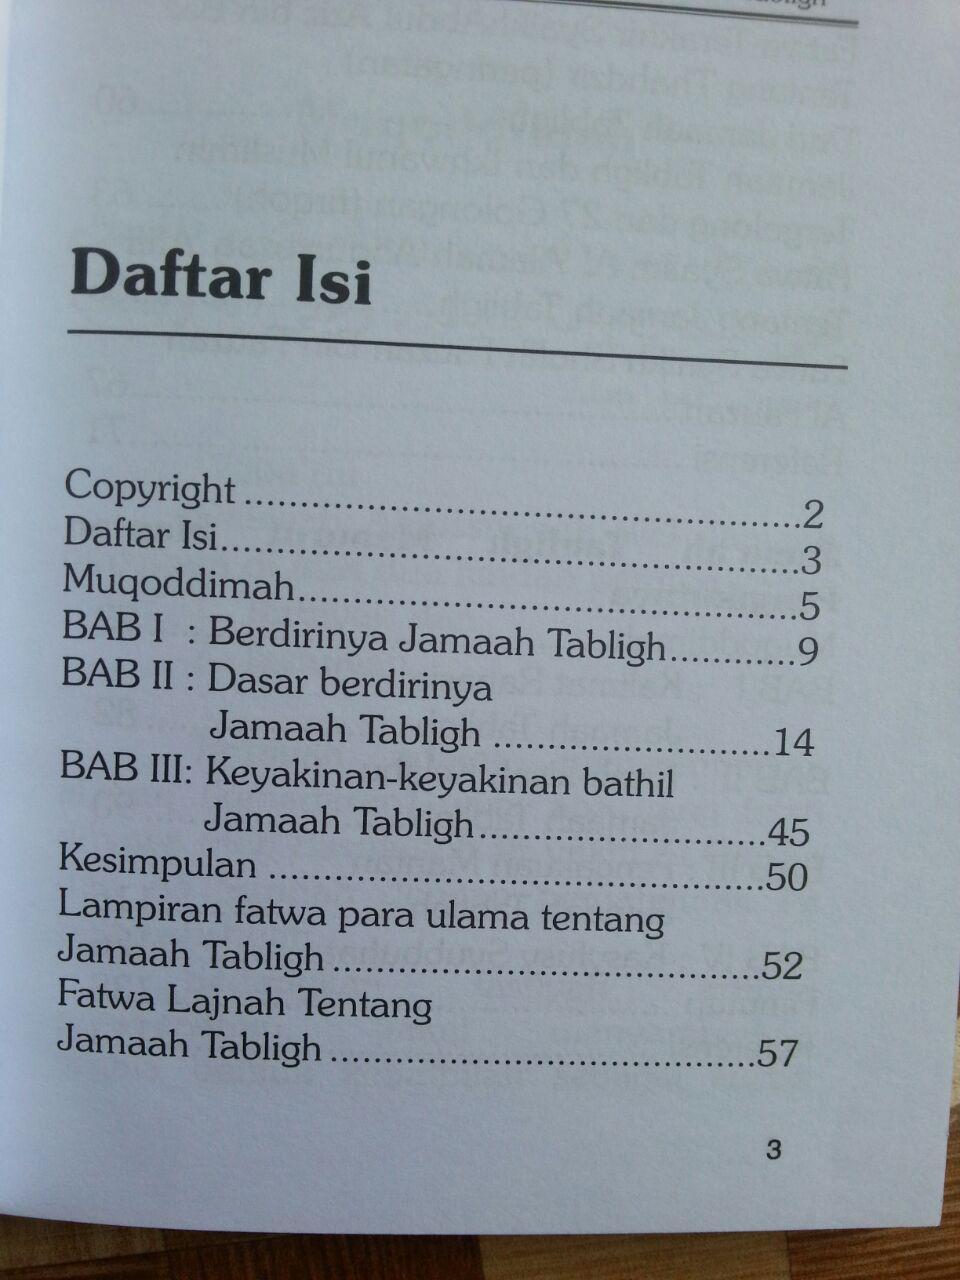 Buku Jamaah Tabligh Kenyataan Dan Pengakuan isi 2